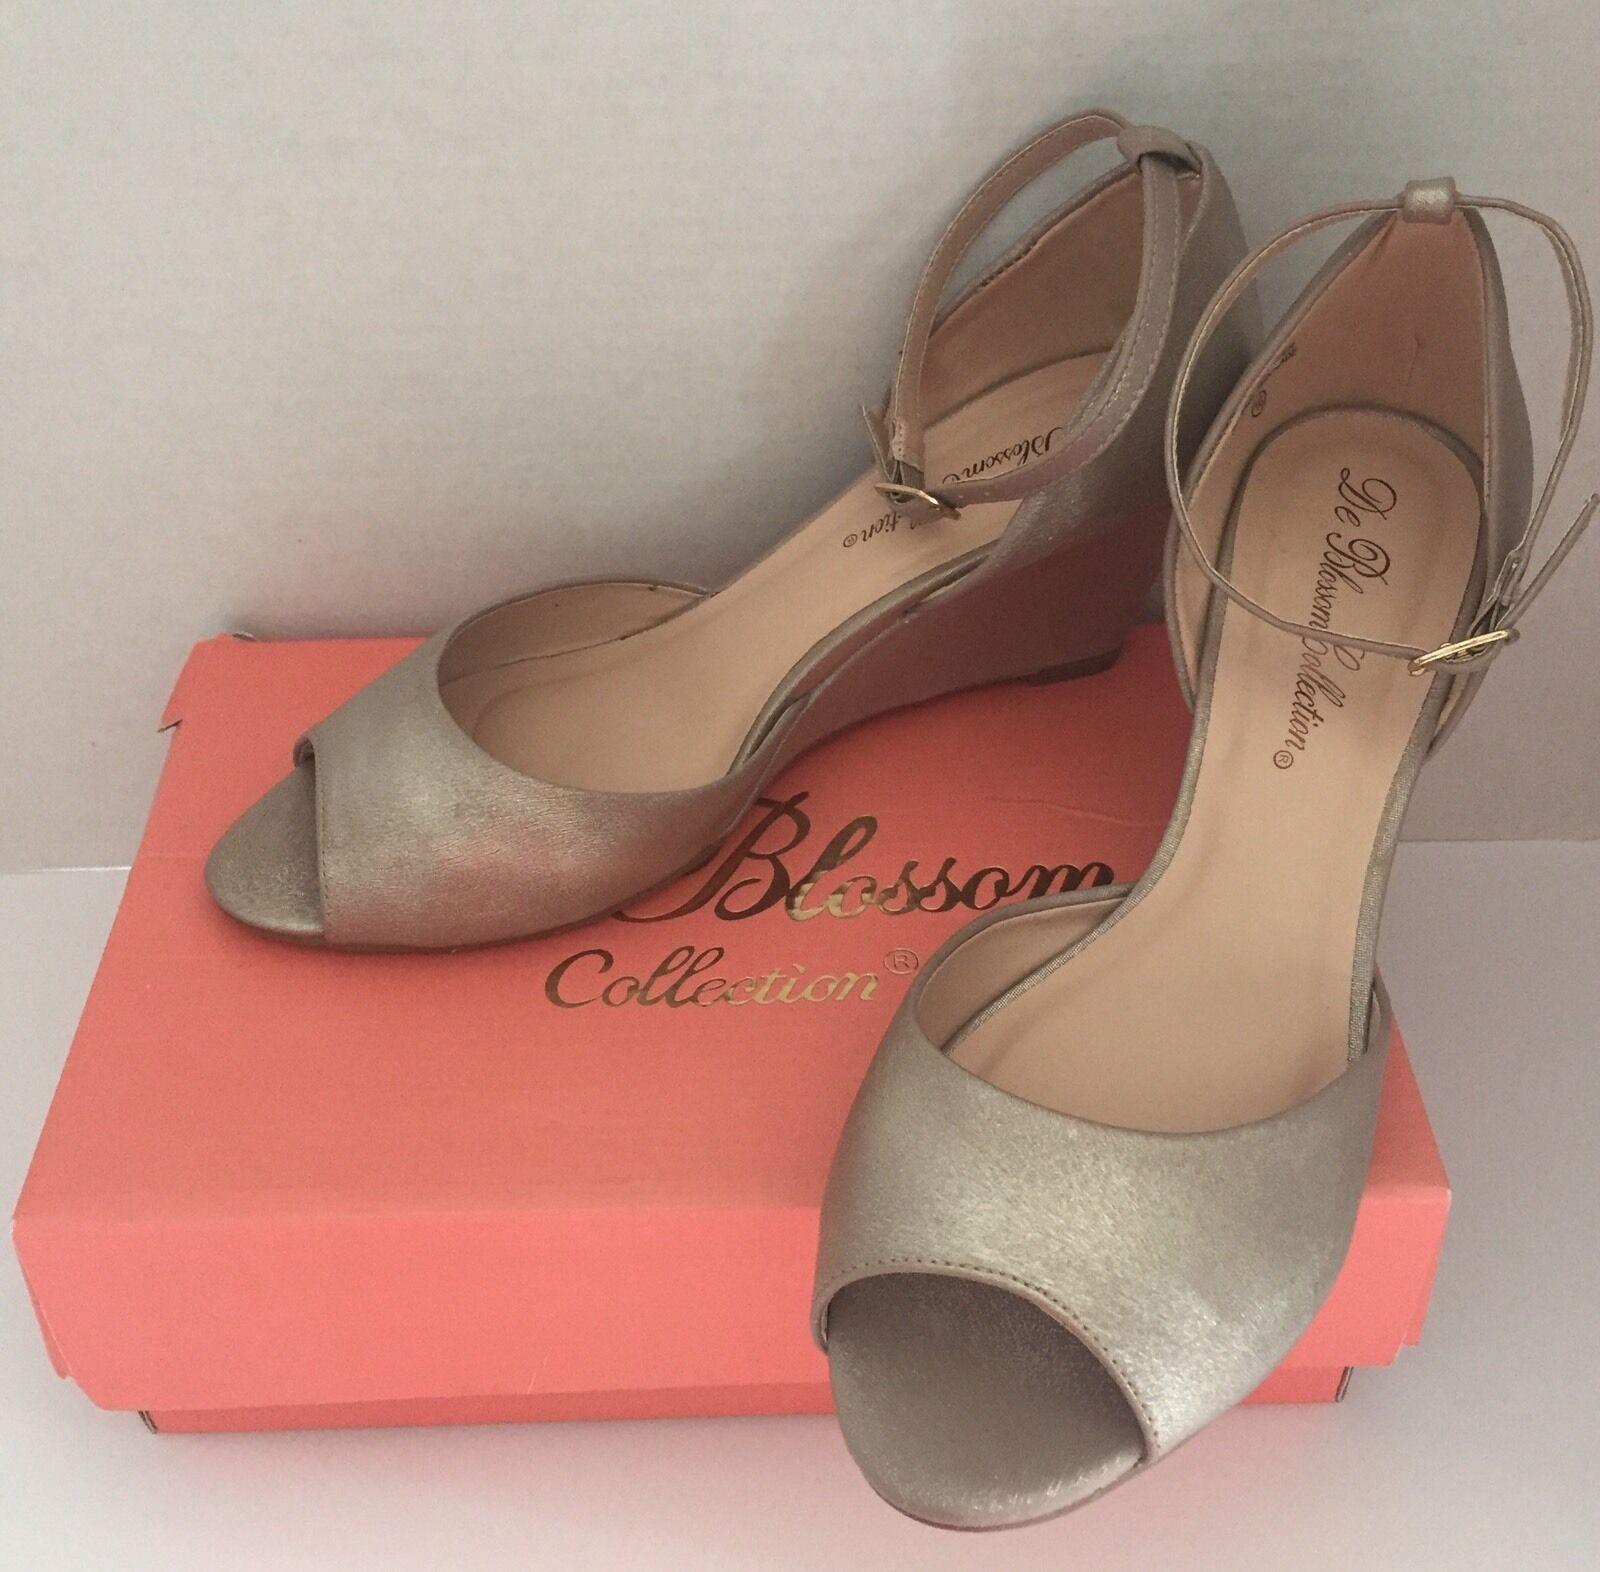 De Strap Blossom Womens Open Toe Dressy Wedge Ankle Strap De Sandals Nude Shimmer 10 5890f9